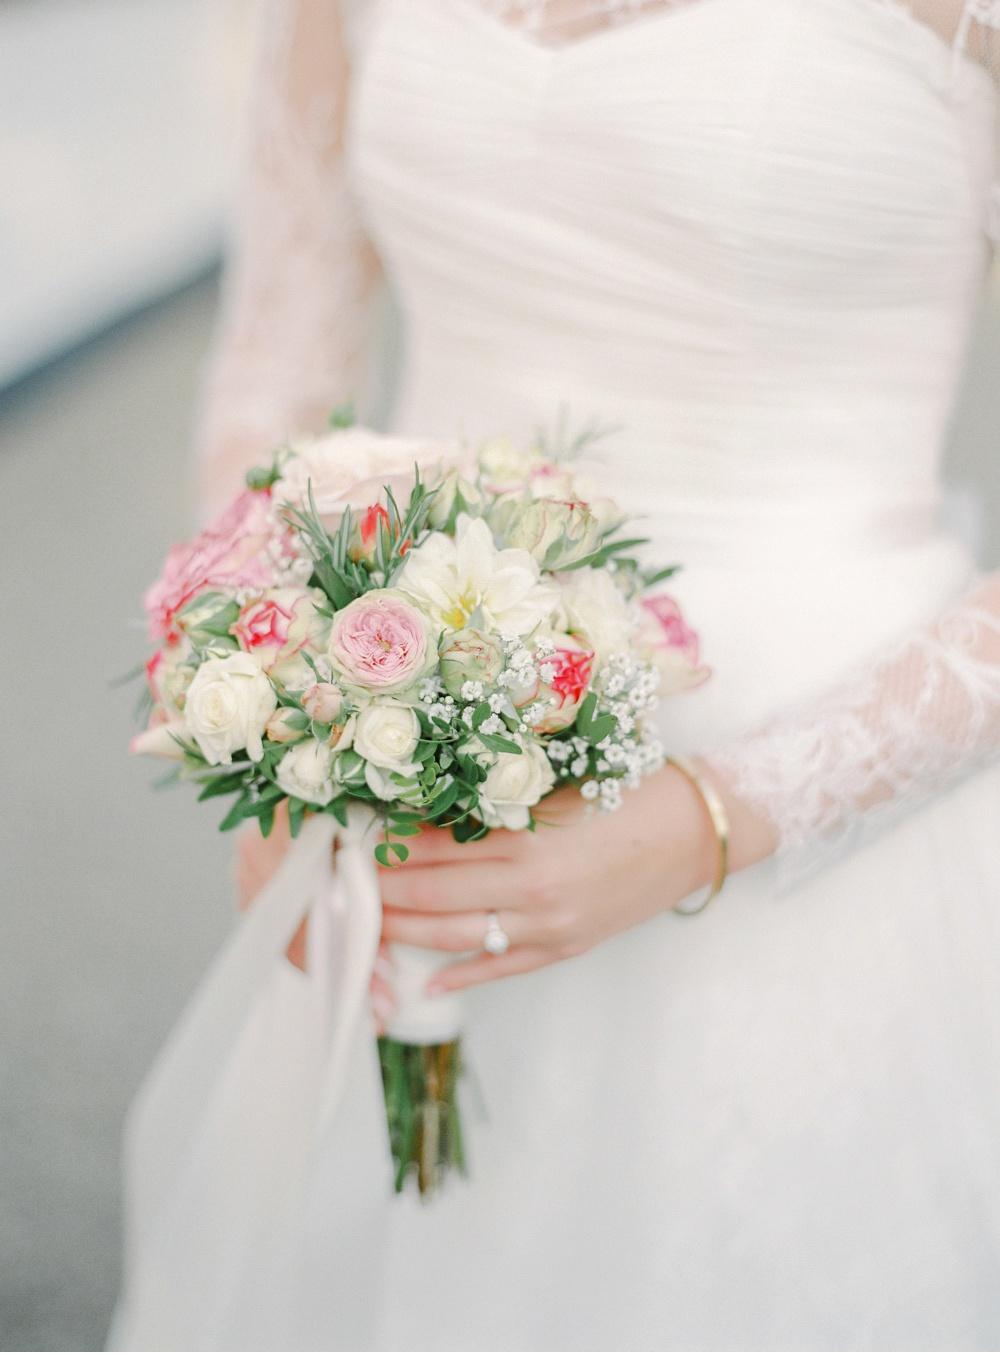 Destination_Wedding_Photographer©MadalinaSheldon__0010.jpg